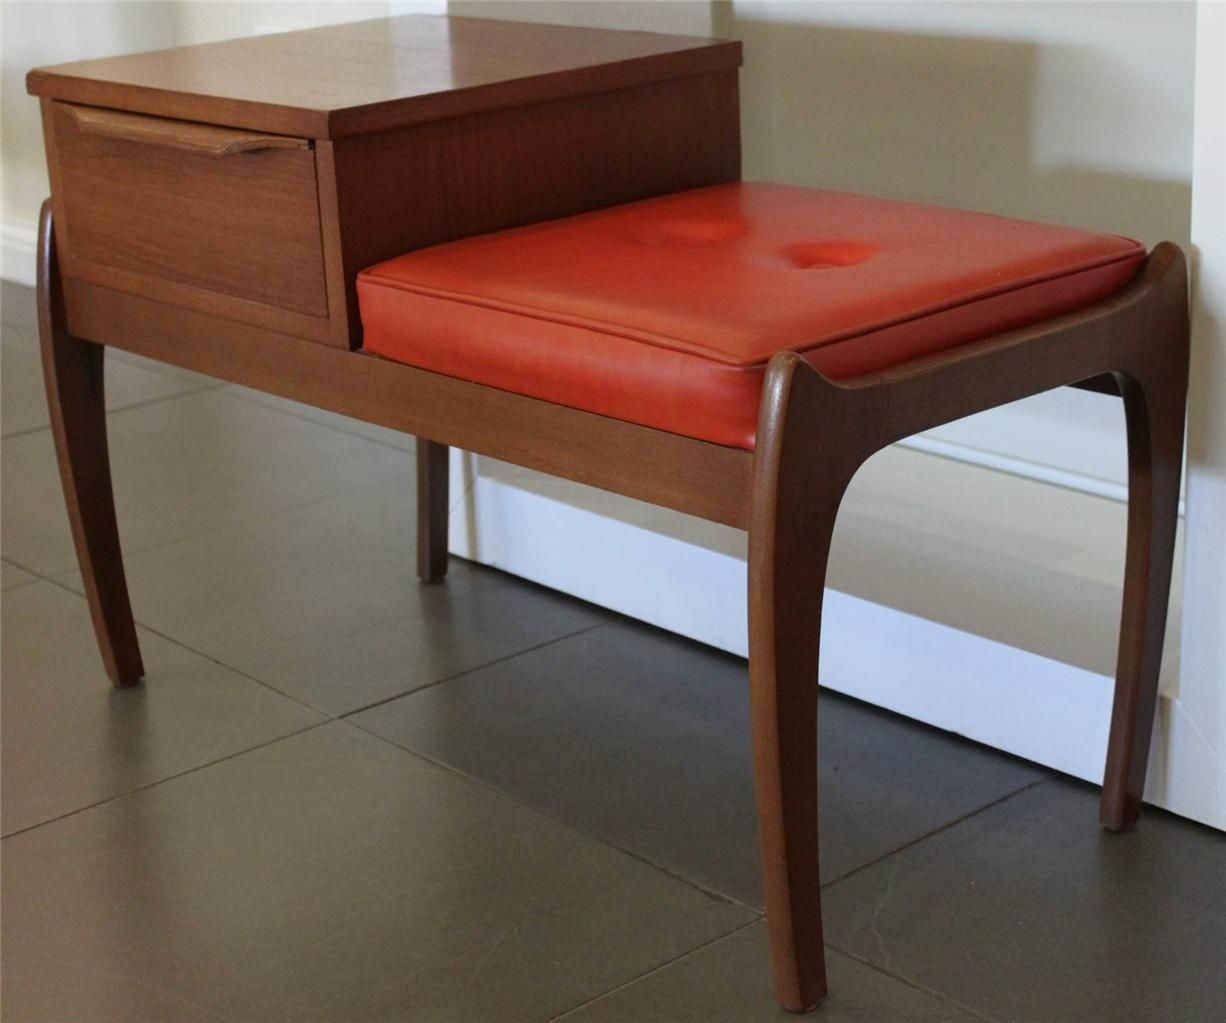 teak retro furniture. Vintage Retro 60\u0027s Danish Style Teak Telephone Table Eames Era Mid-Century | EBay Furniture E